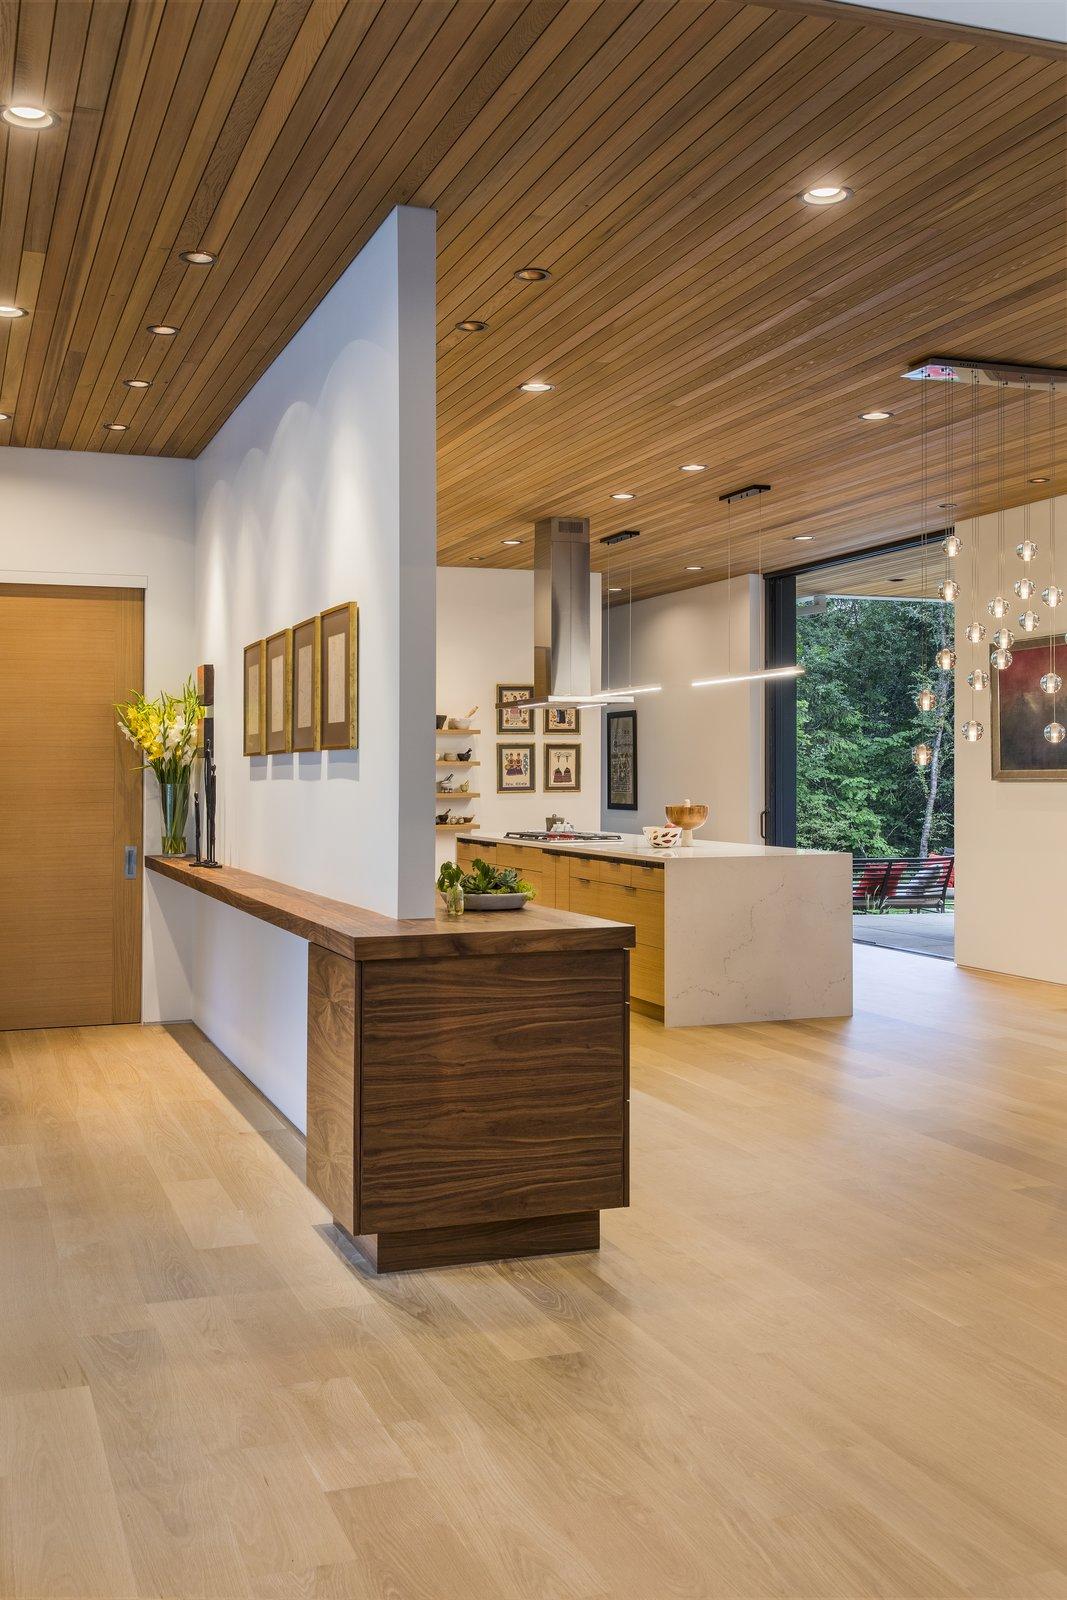 Hallway and Light Hardwood Floor  Wildwood by Giulietti / Schouten AIA Architects